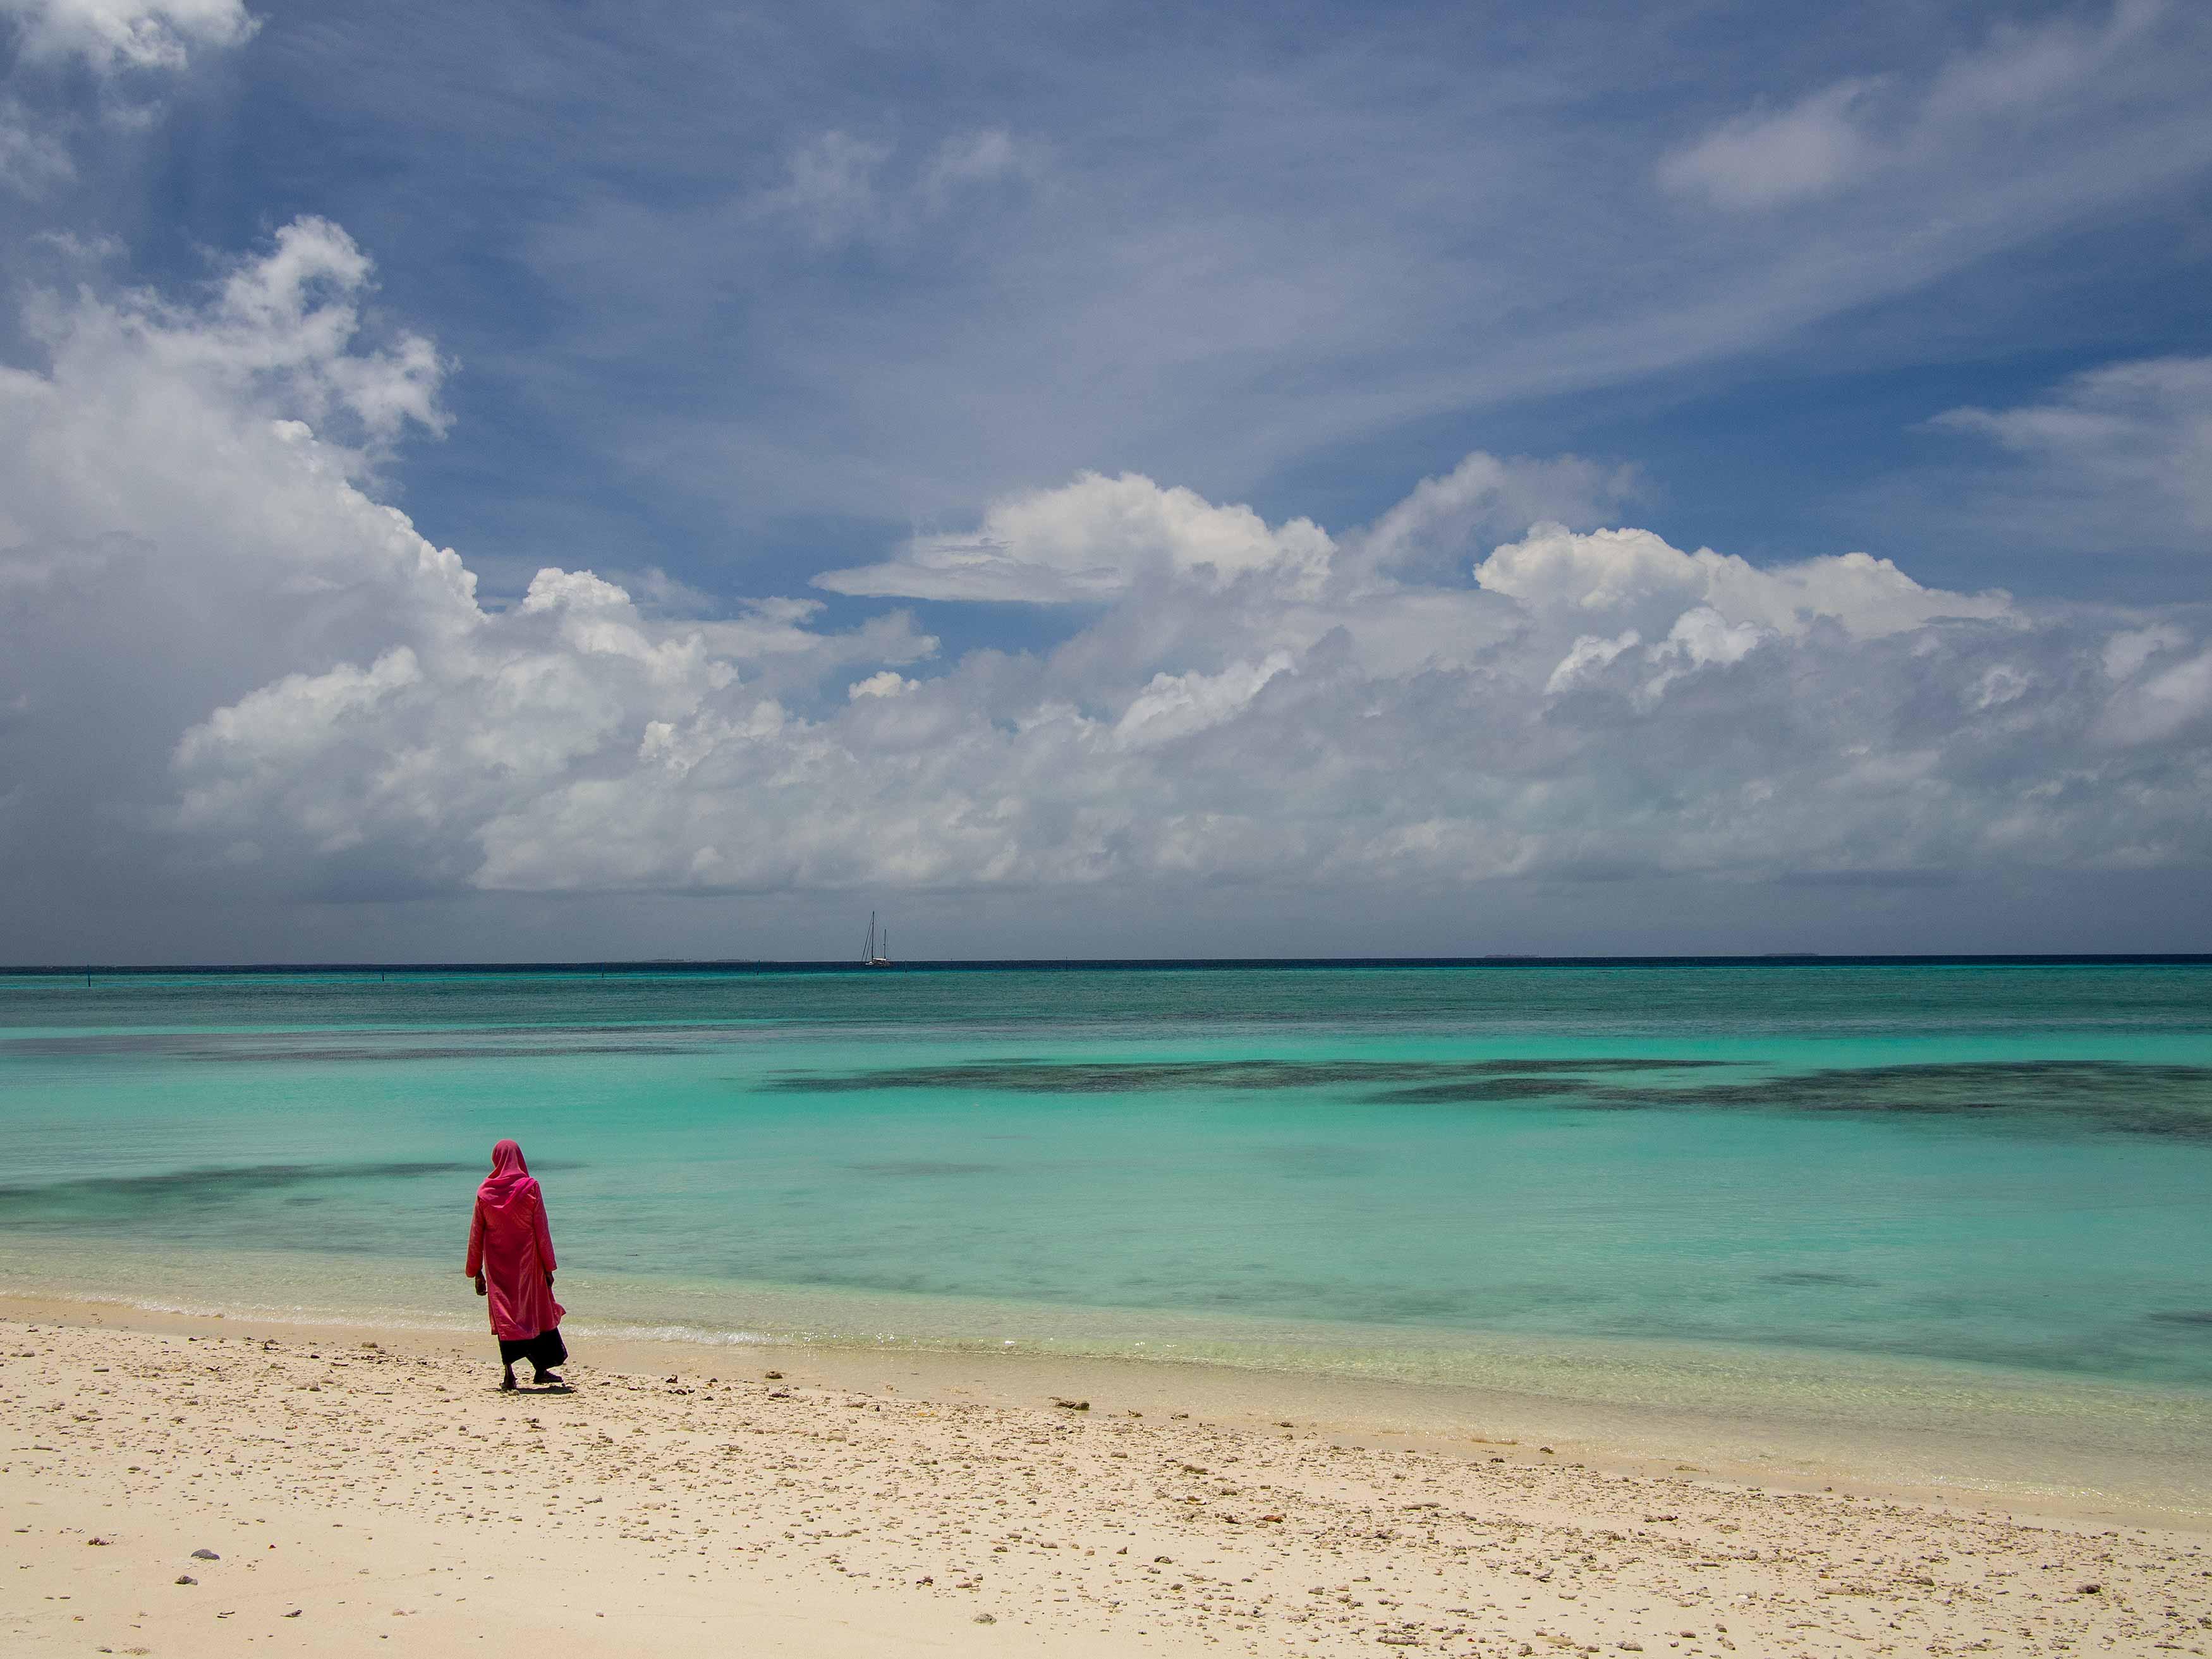 (Near) desolate beaches, Uligamu, Maldives (2013)